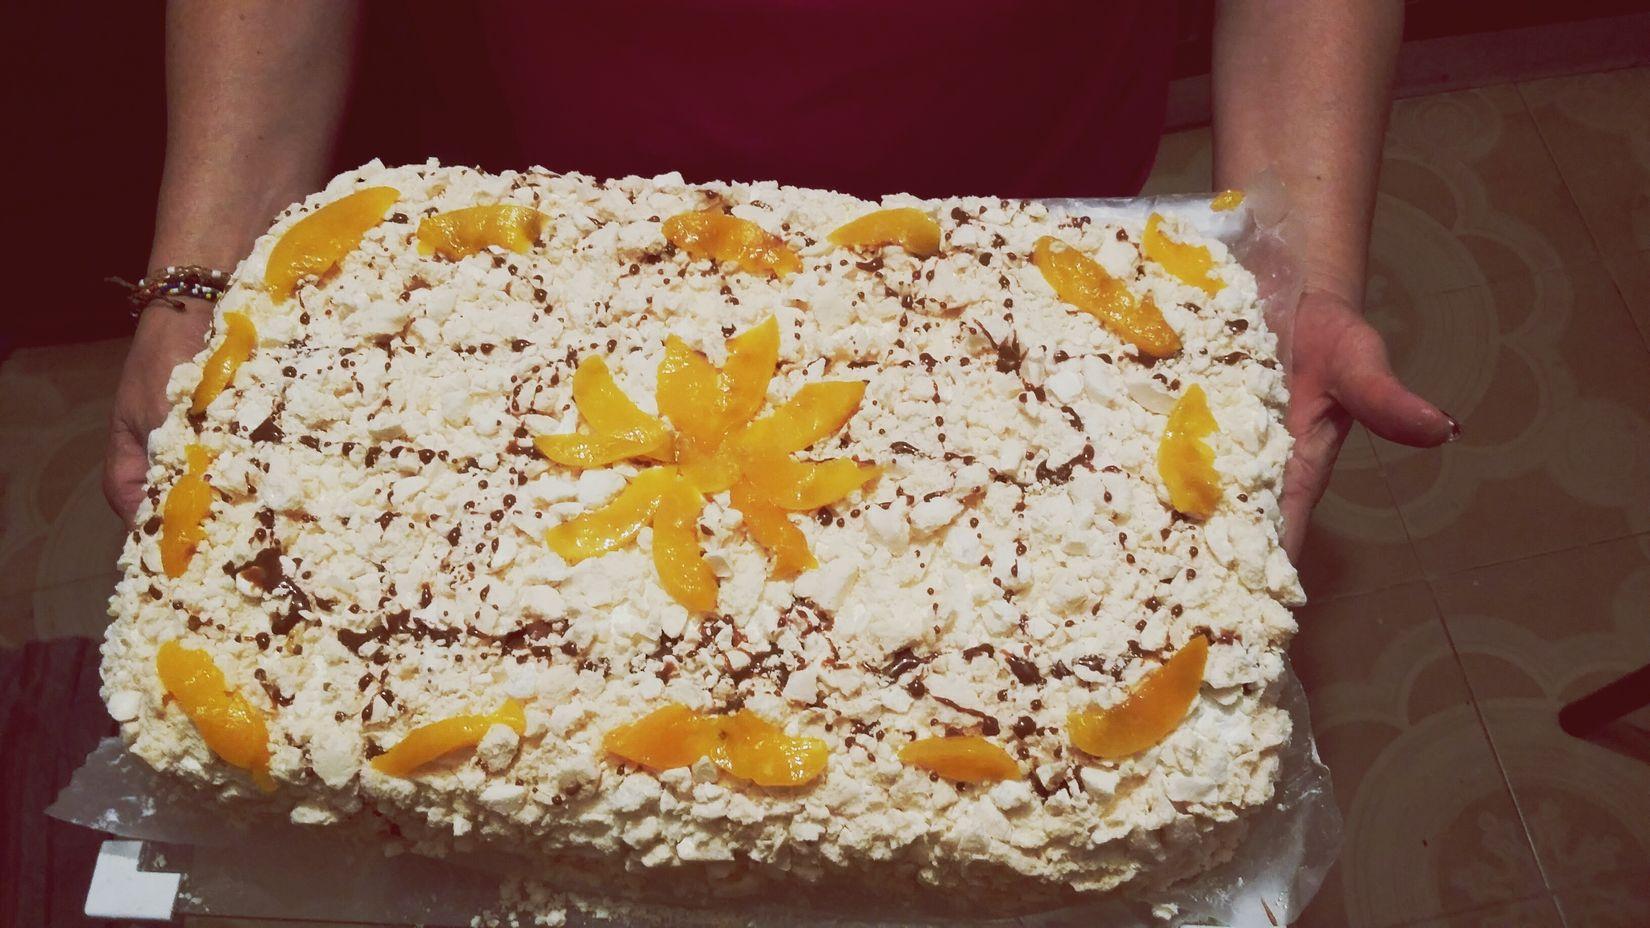 Lo mejor de la comida uruguaya 😍😍Chaja Cake♥ Yummy♡ Traditionalfood Uruguay♥♥